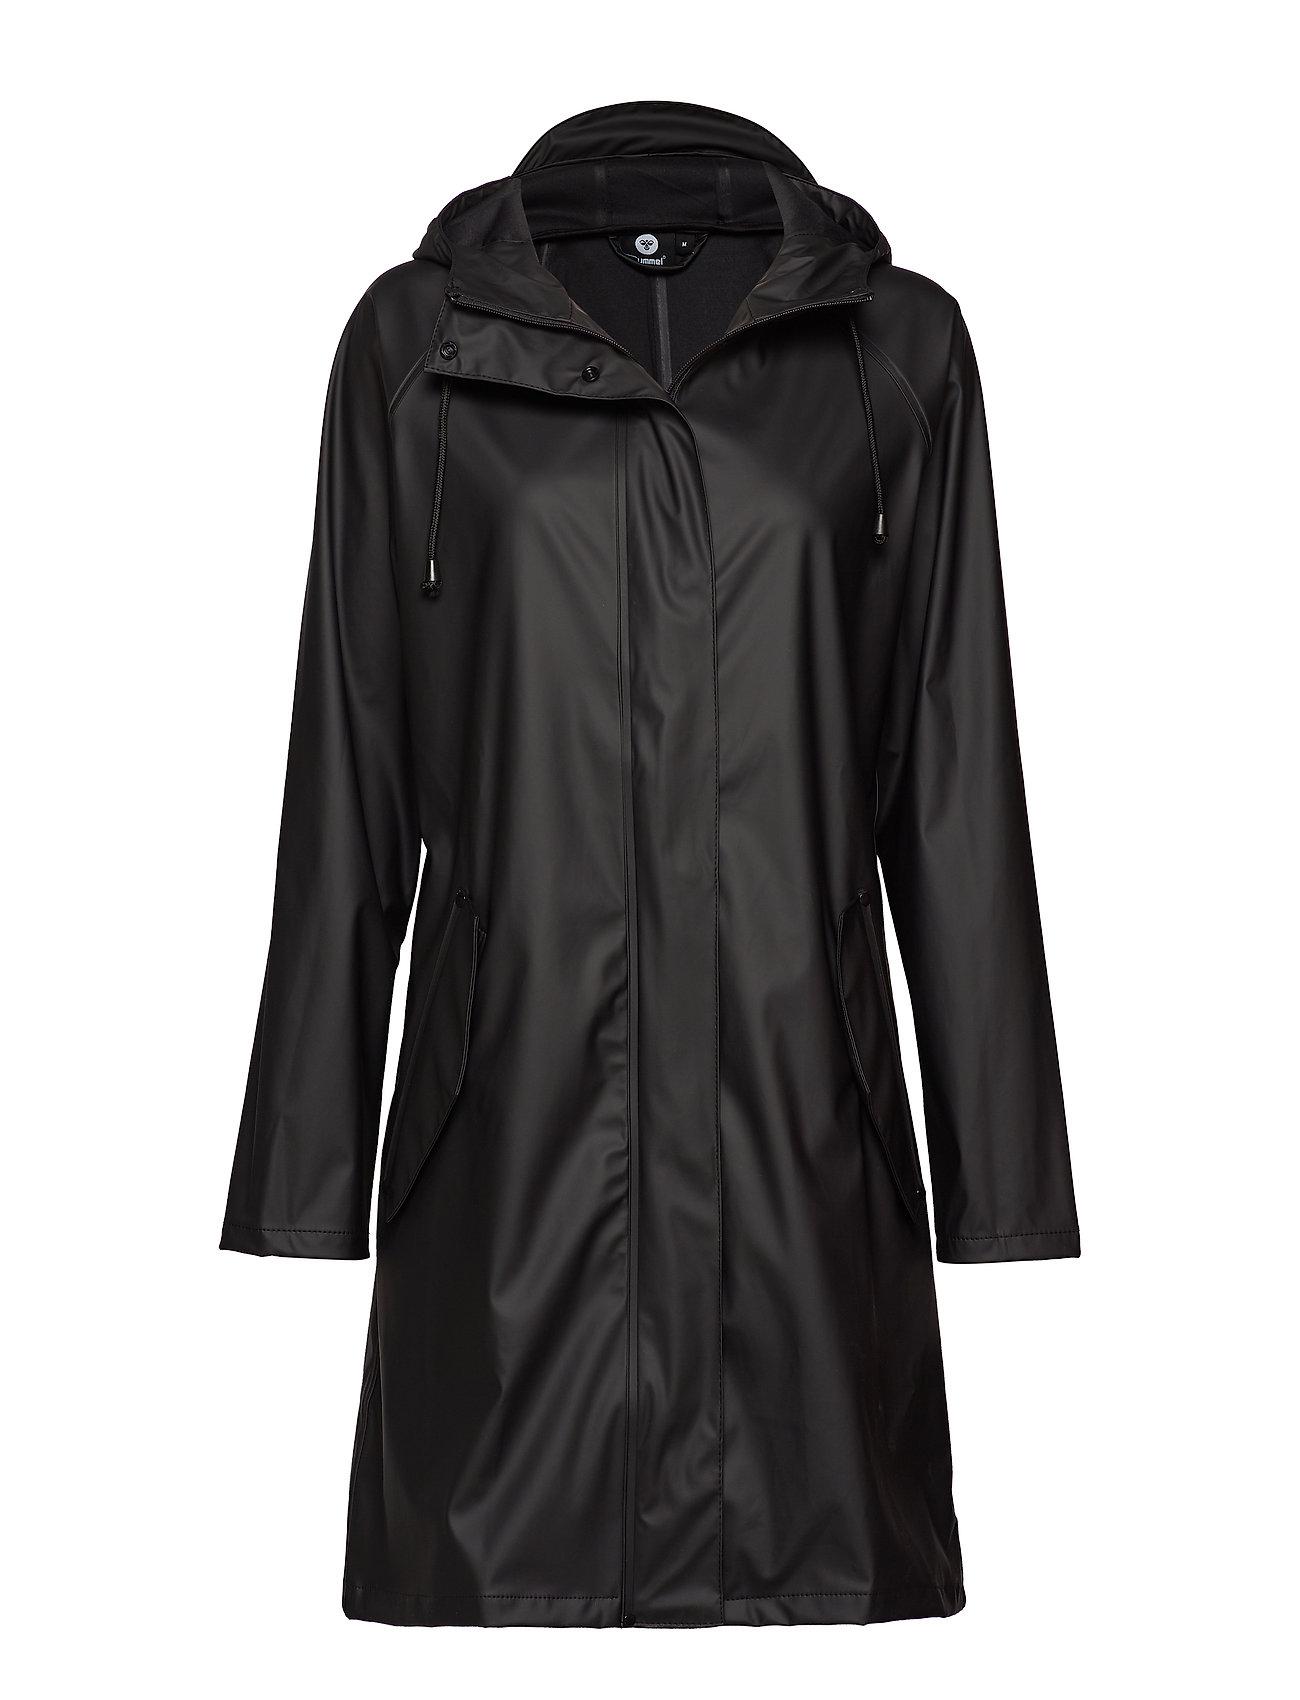 Hummel hmlJOY RAIN COAT Ytterkläder